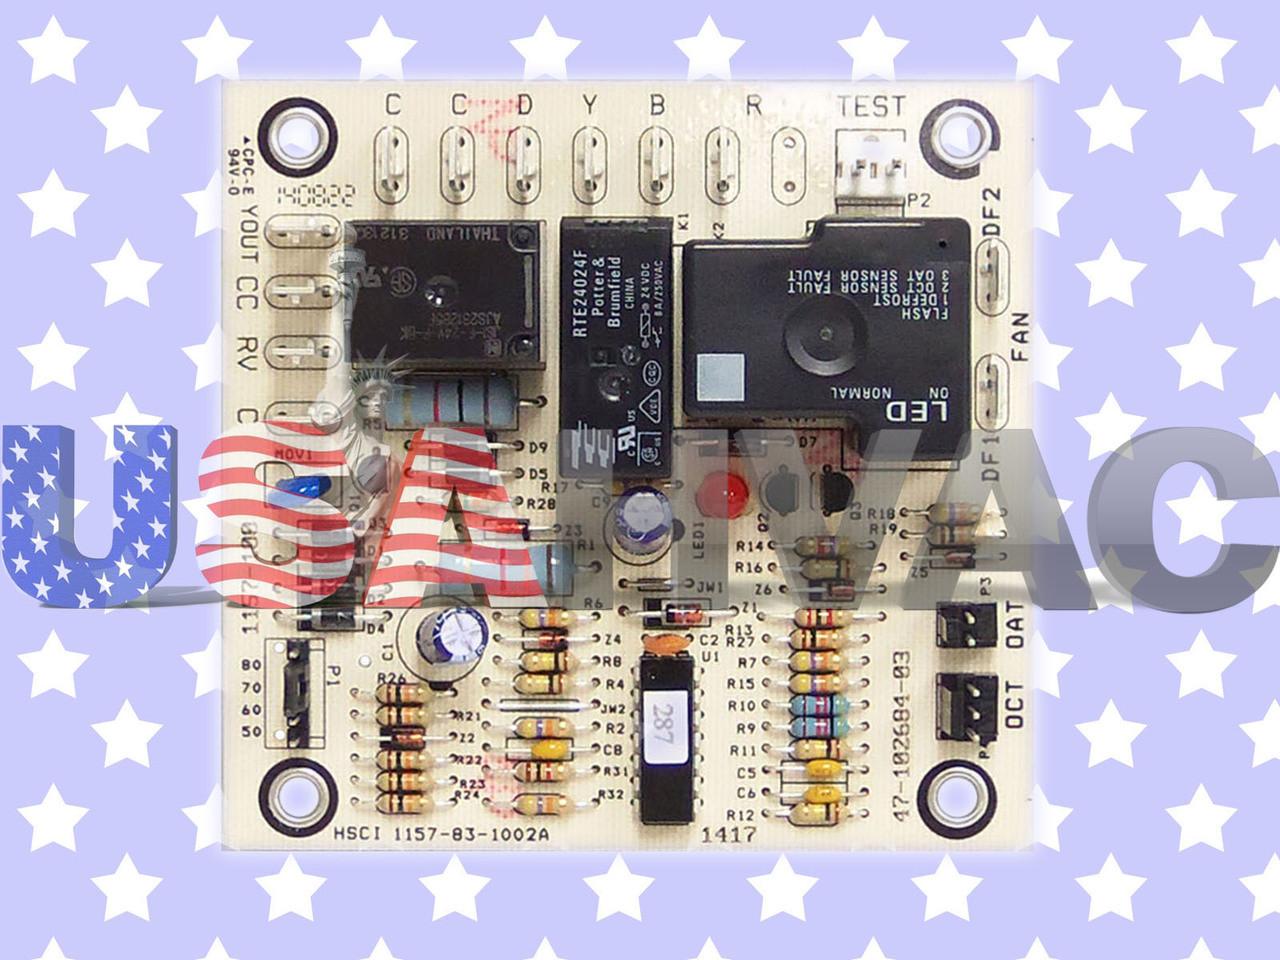 47-21517-13 Rheem Ruud Weather King Heat Pump Defrost Control Board /& Sensor